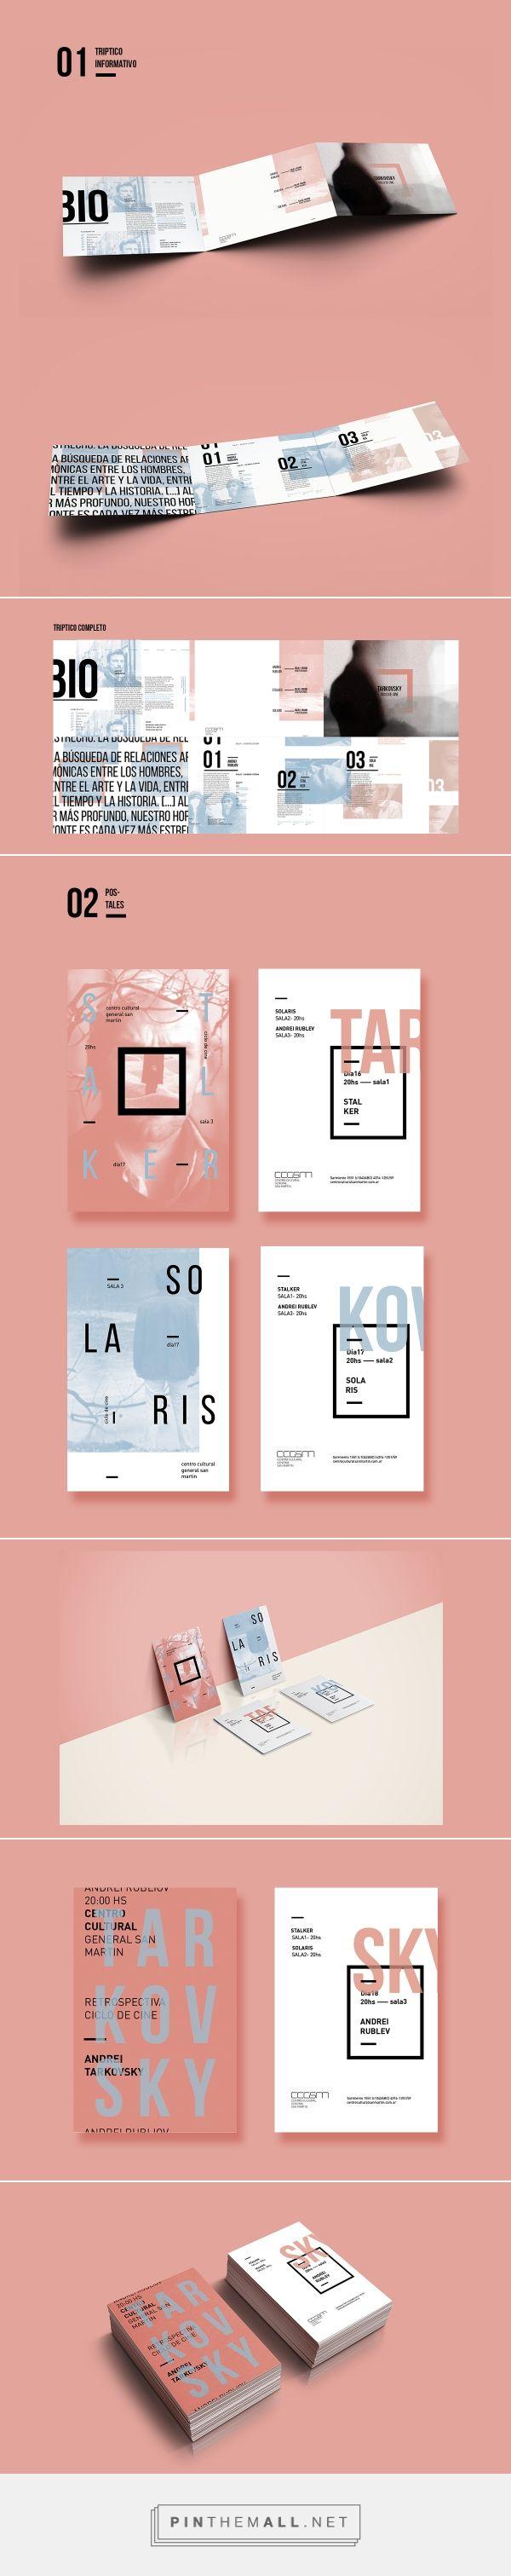 Ciclo de Cine Film Series Branding by Nahuel Mercado   Fivestar Branding Agency – Design and Branding Agency & Inspiration Gallery